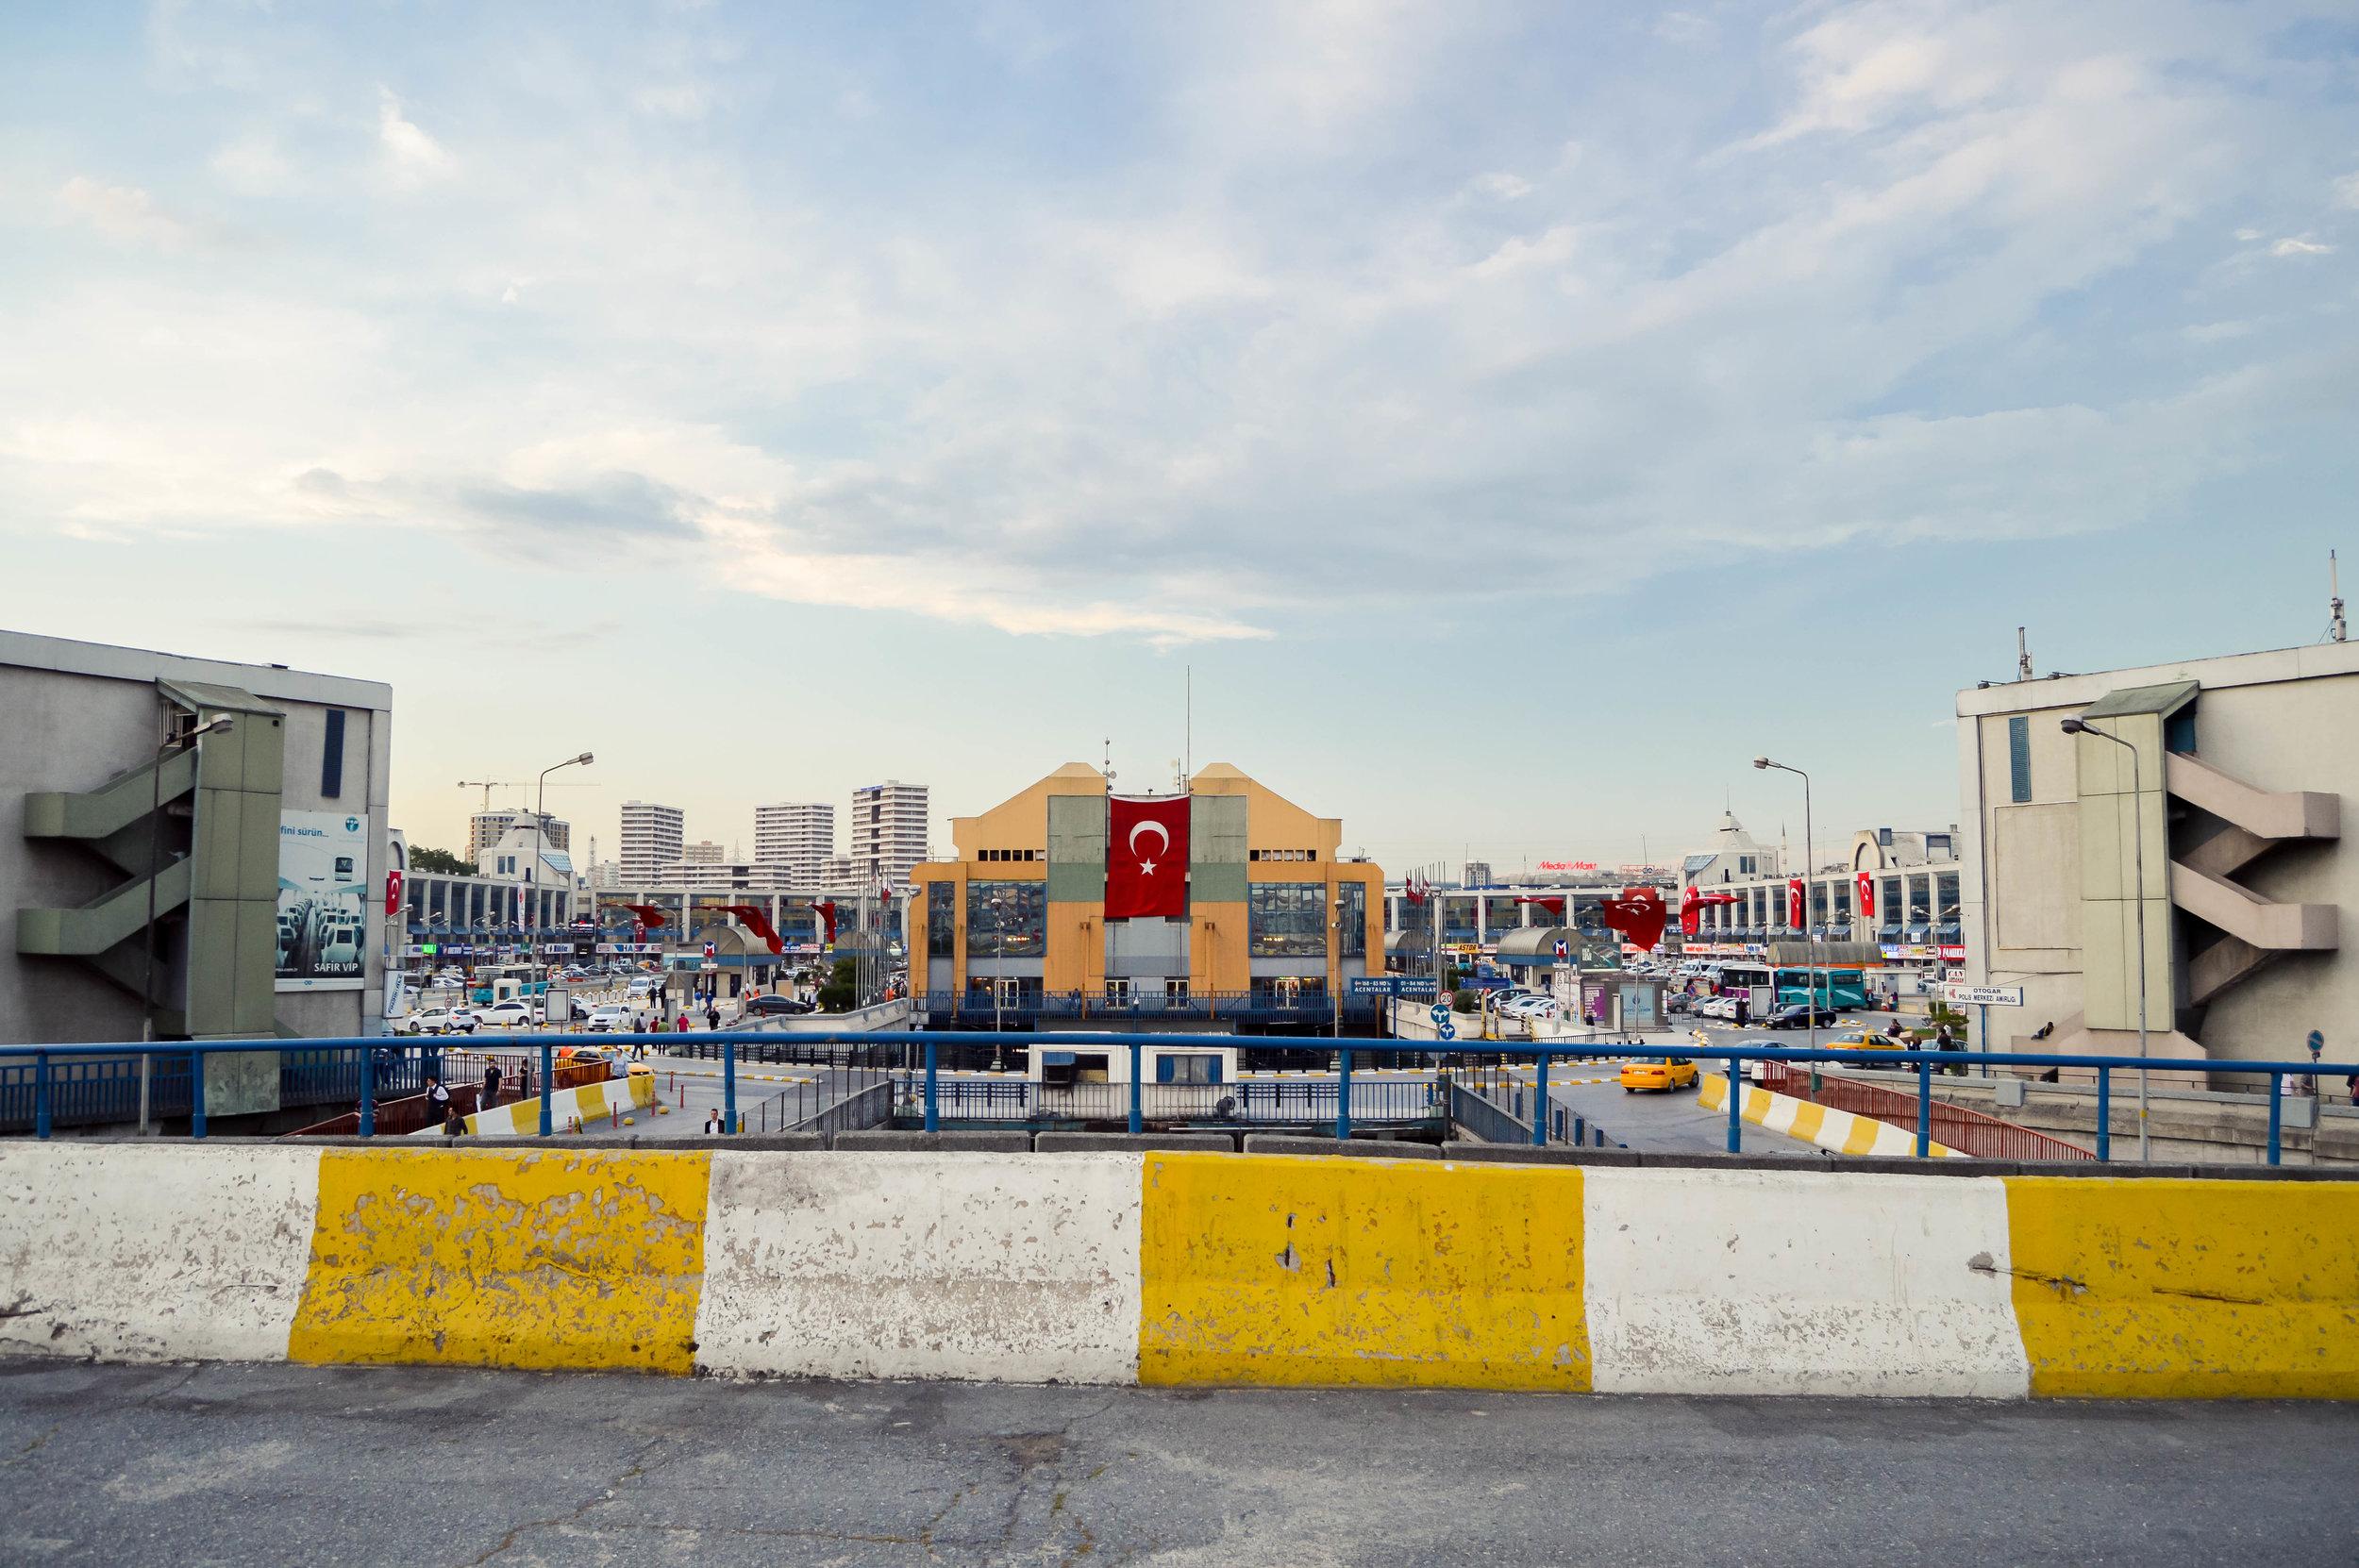 Esenler Otogarı Istanbul Bus Terminal Mosques Skyline Blue Sky Muslim Ottoman Empire Architecture Istanbul Turkey